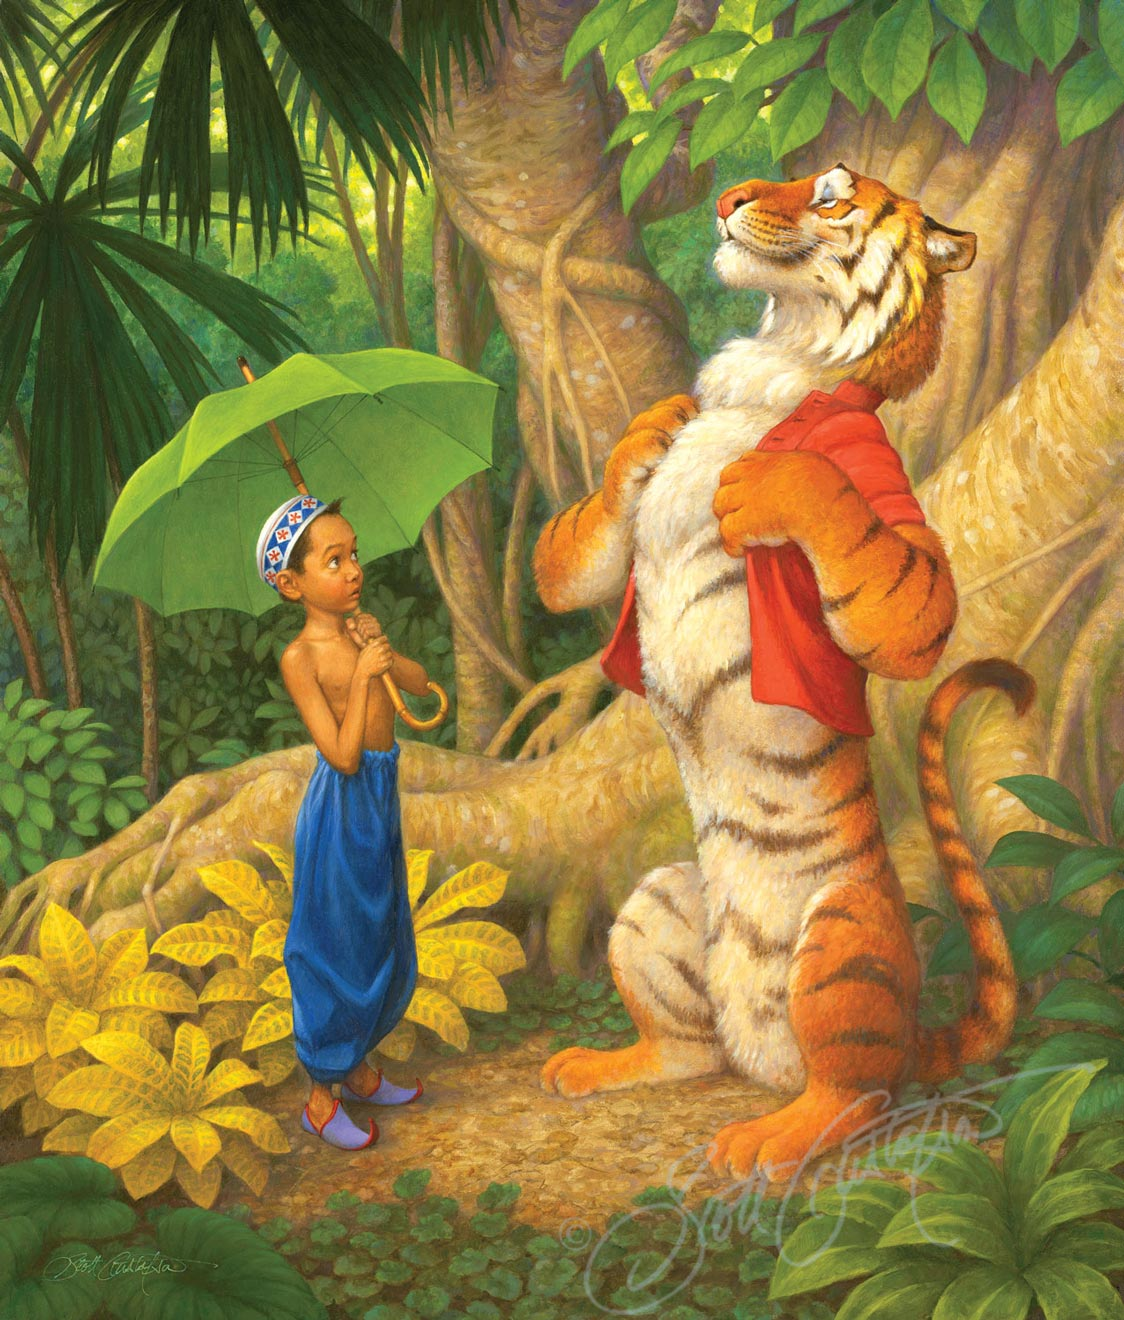 2_sambha_and_tiger_red_coat.jpg